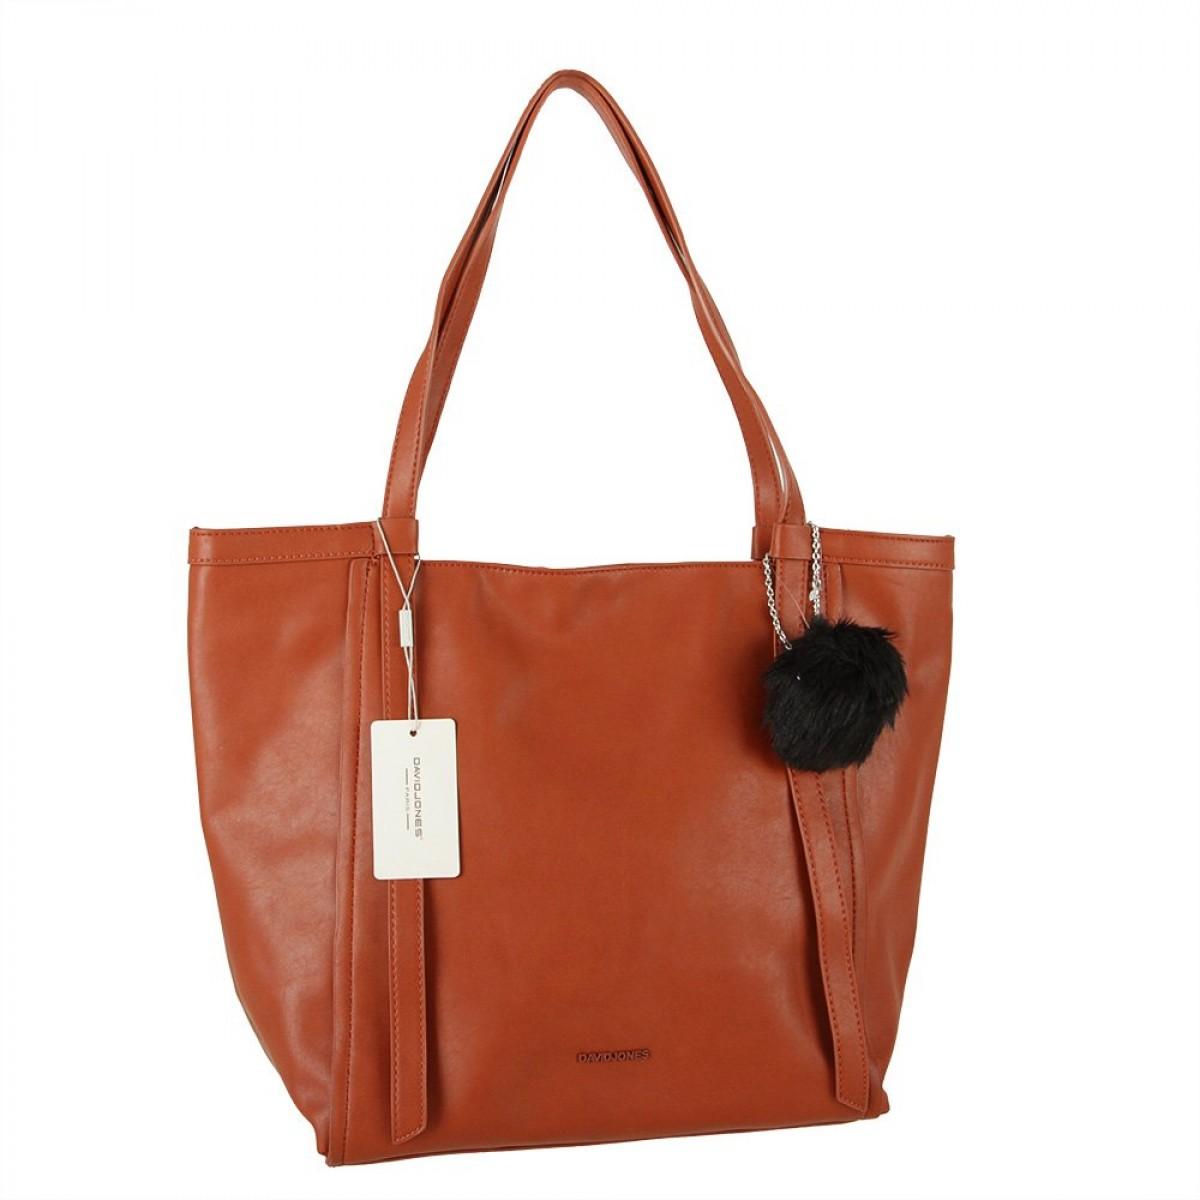 Жіноча сумка David Jones CM5856 SIENNA